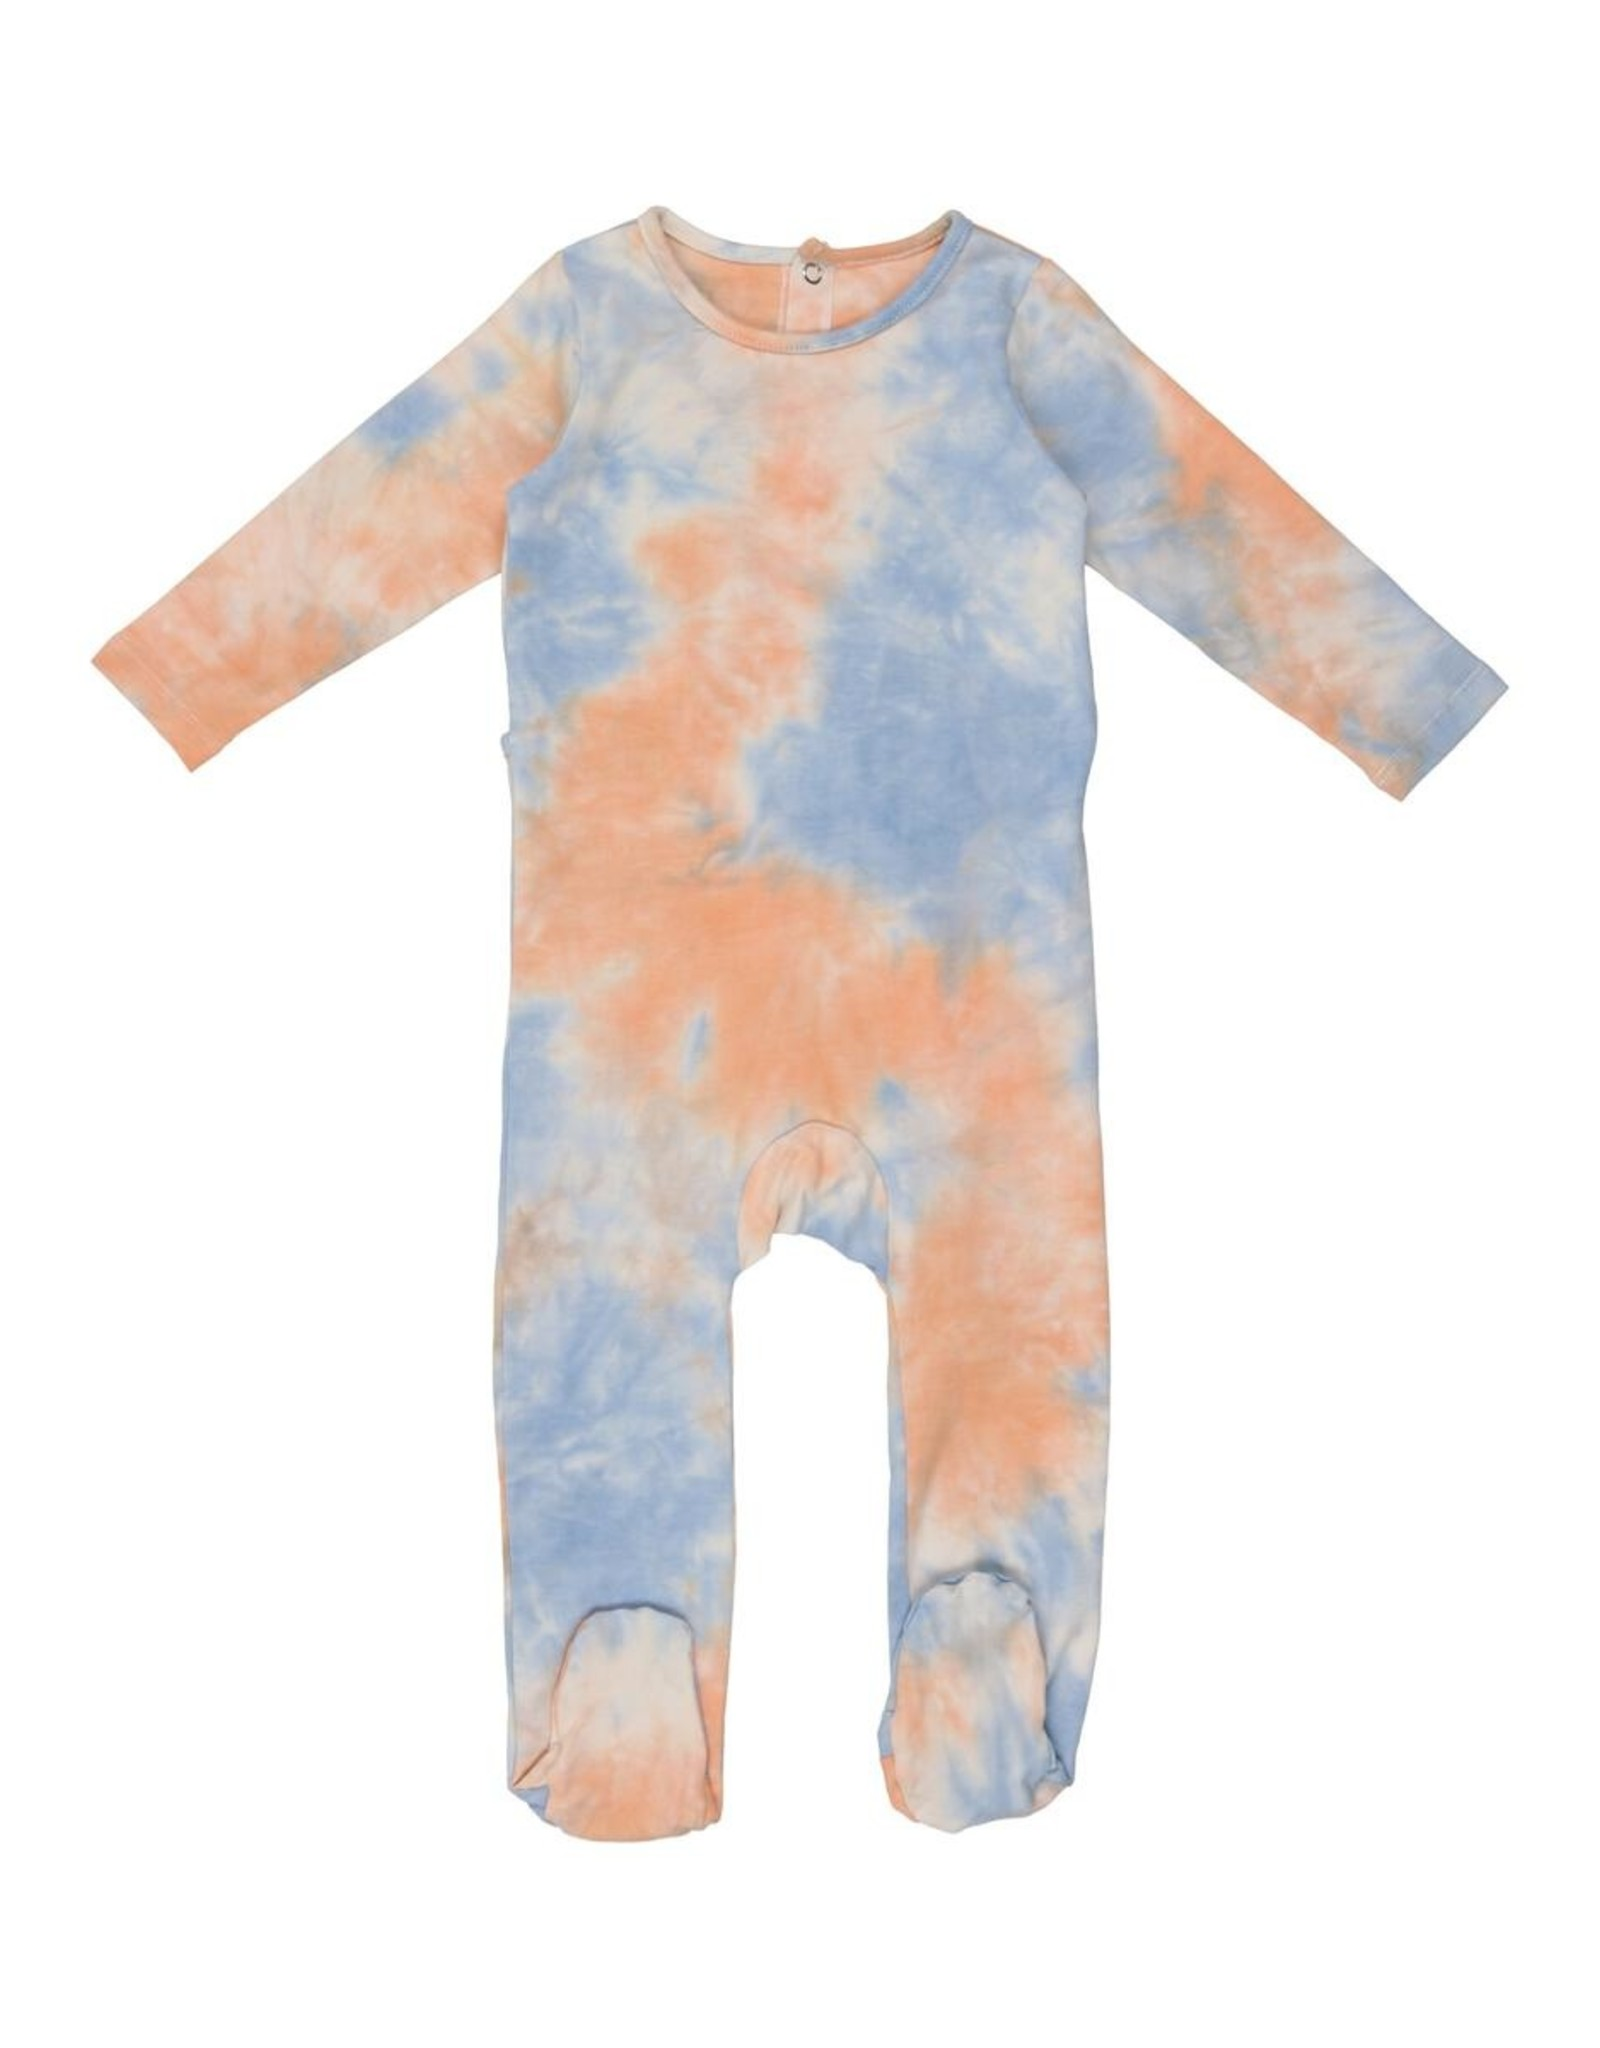 Pouf Pouf TieDye Footie Pajama